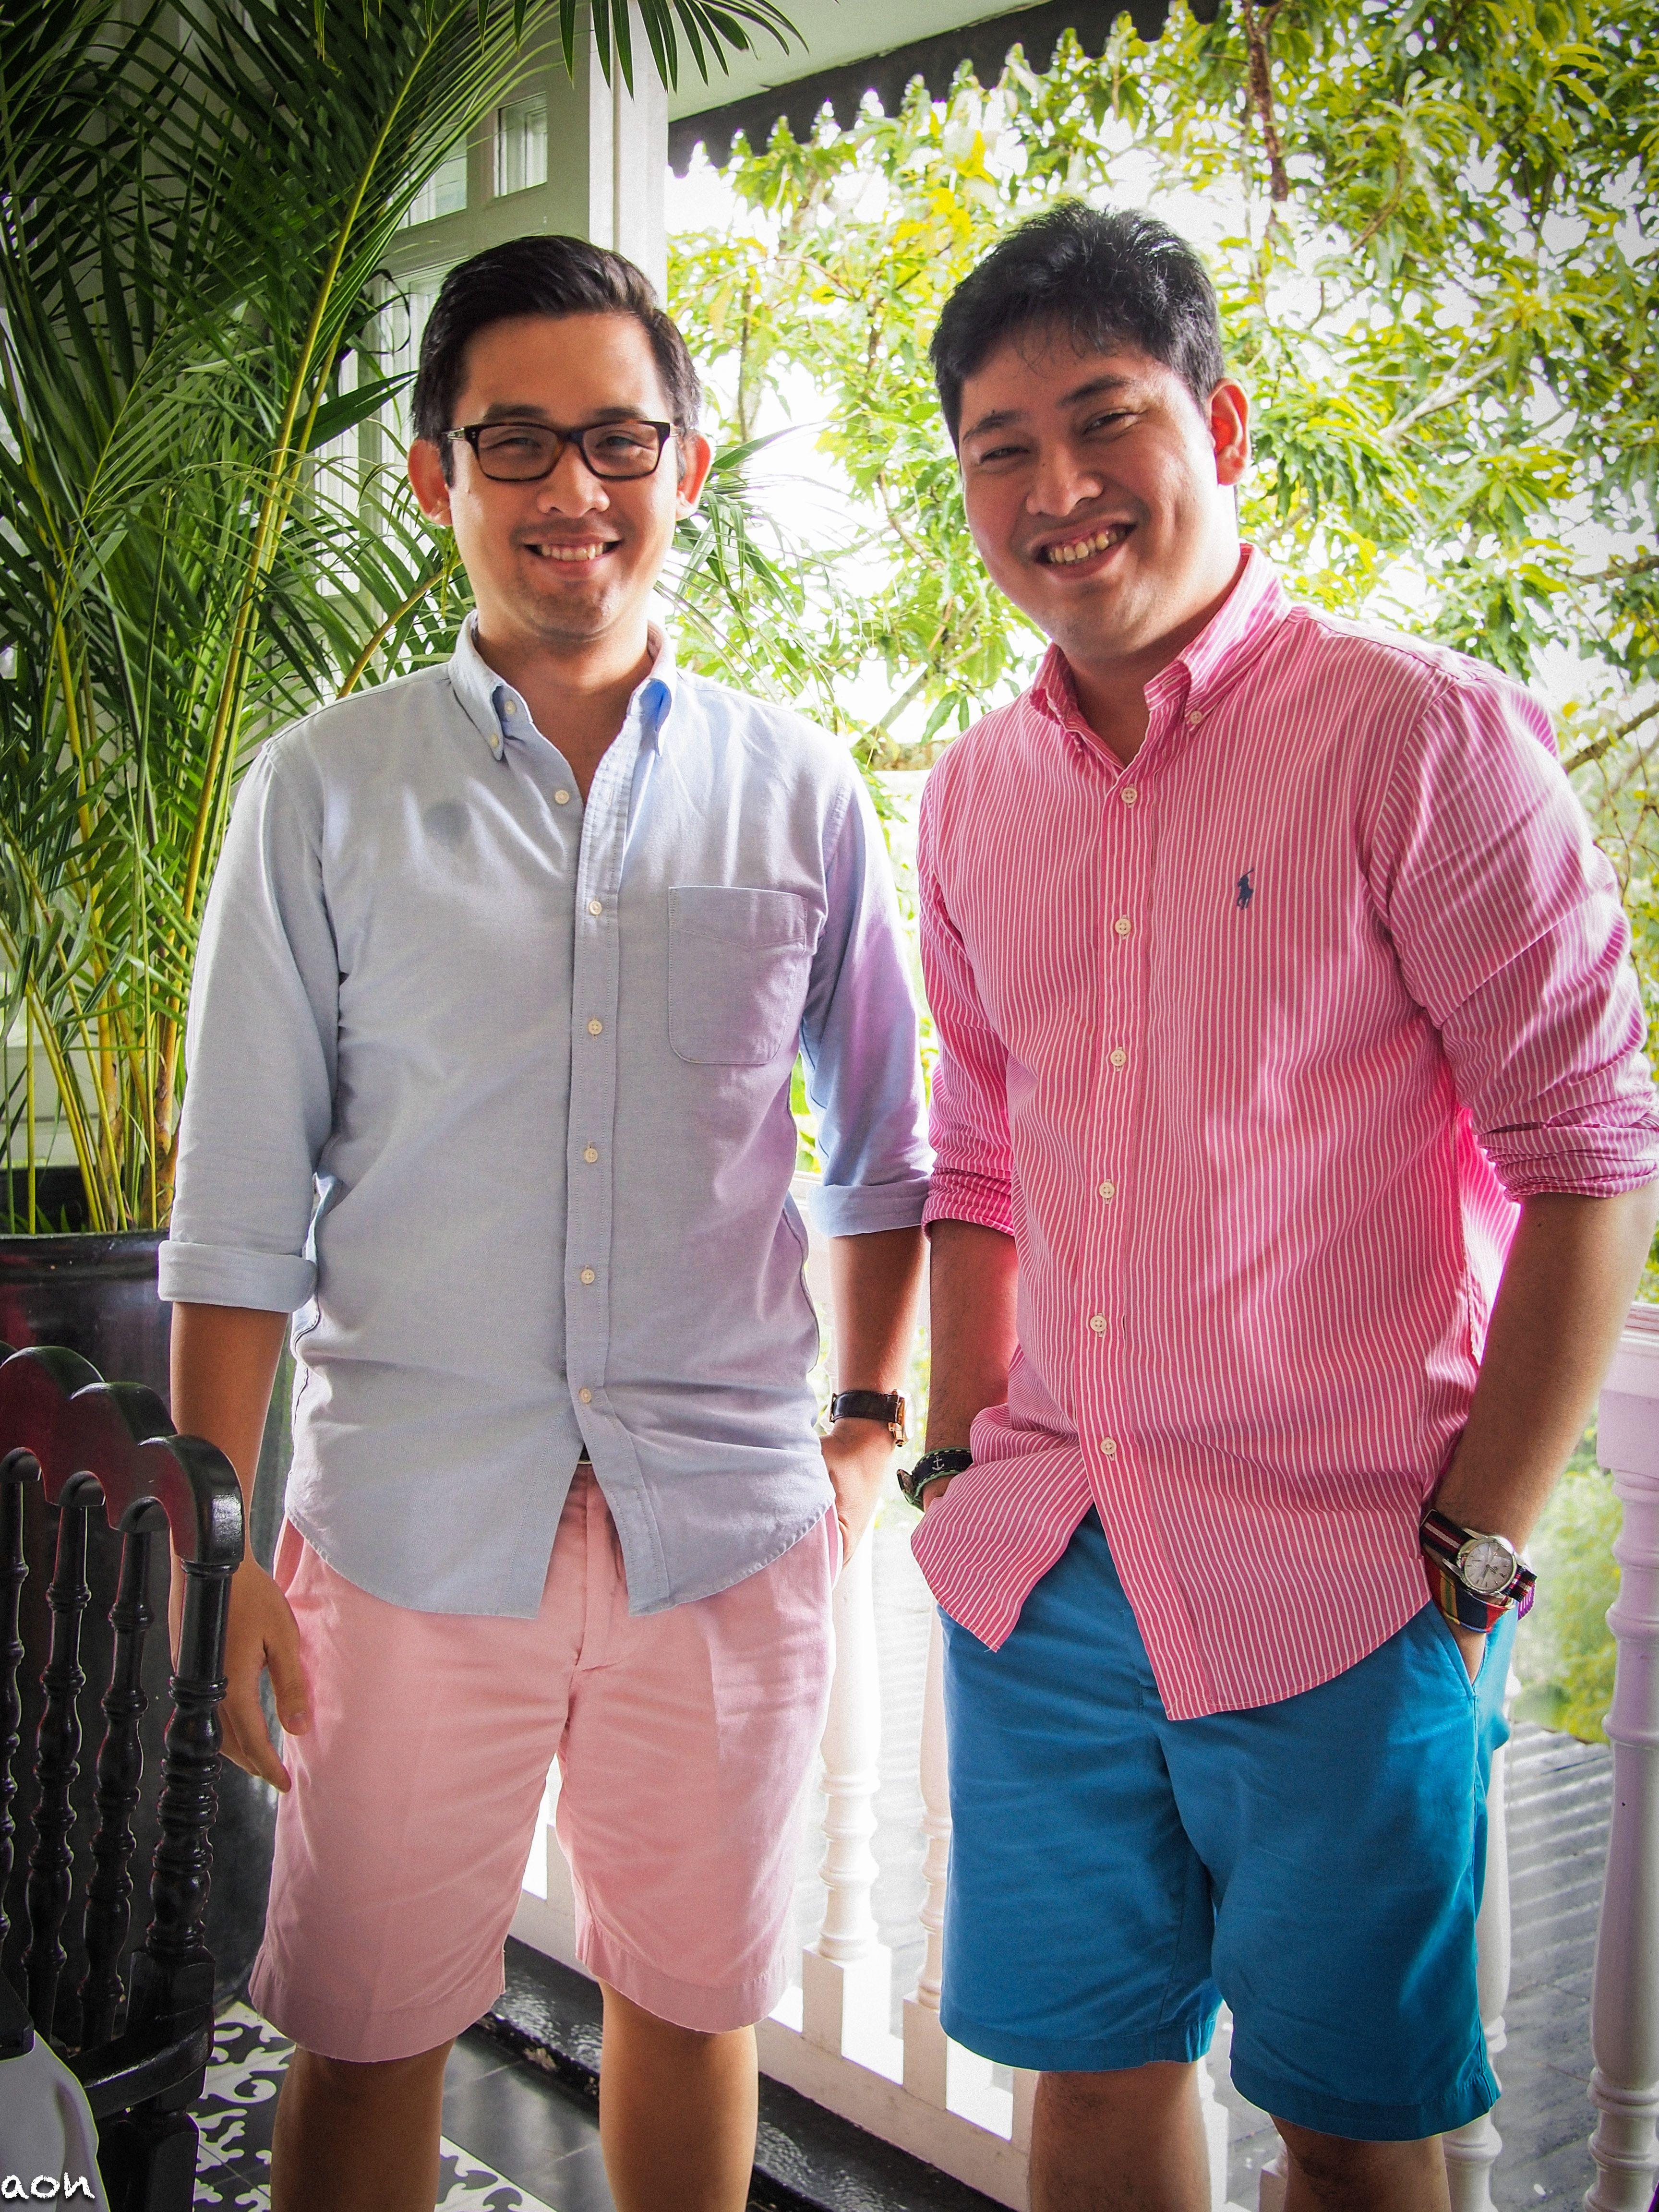 preppy summer outfits - pink ralph lauren shirt | Outfits I love ...